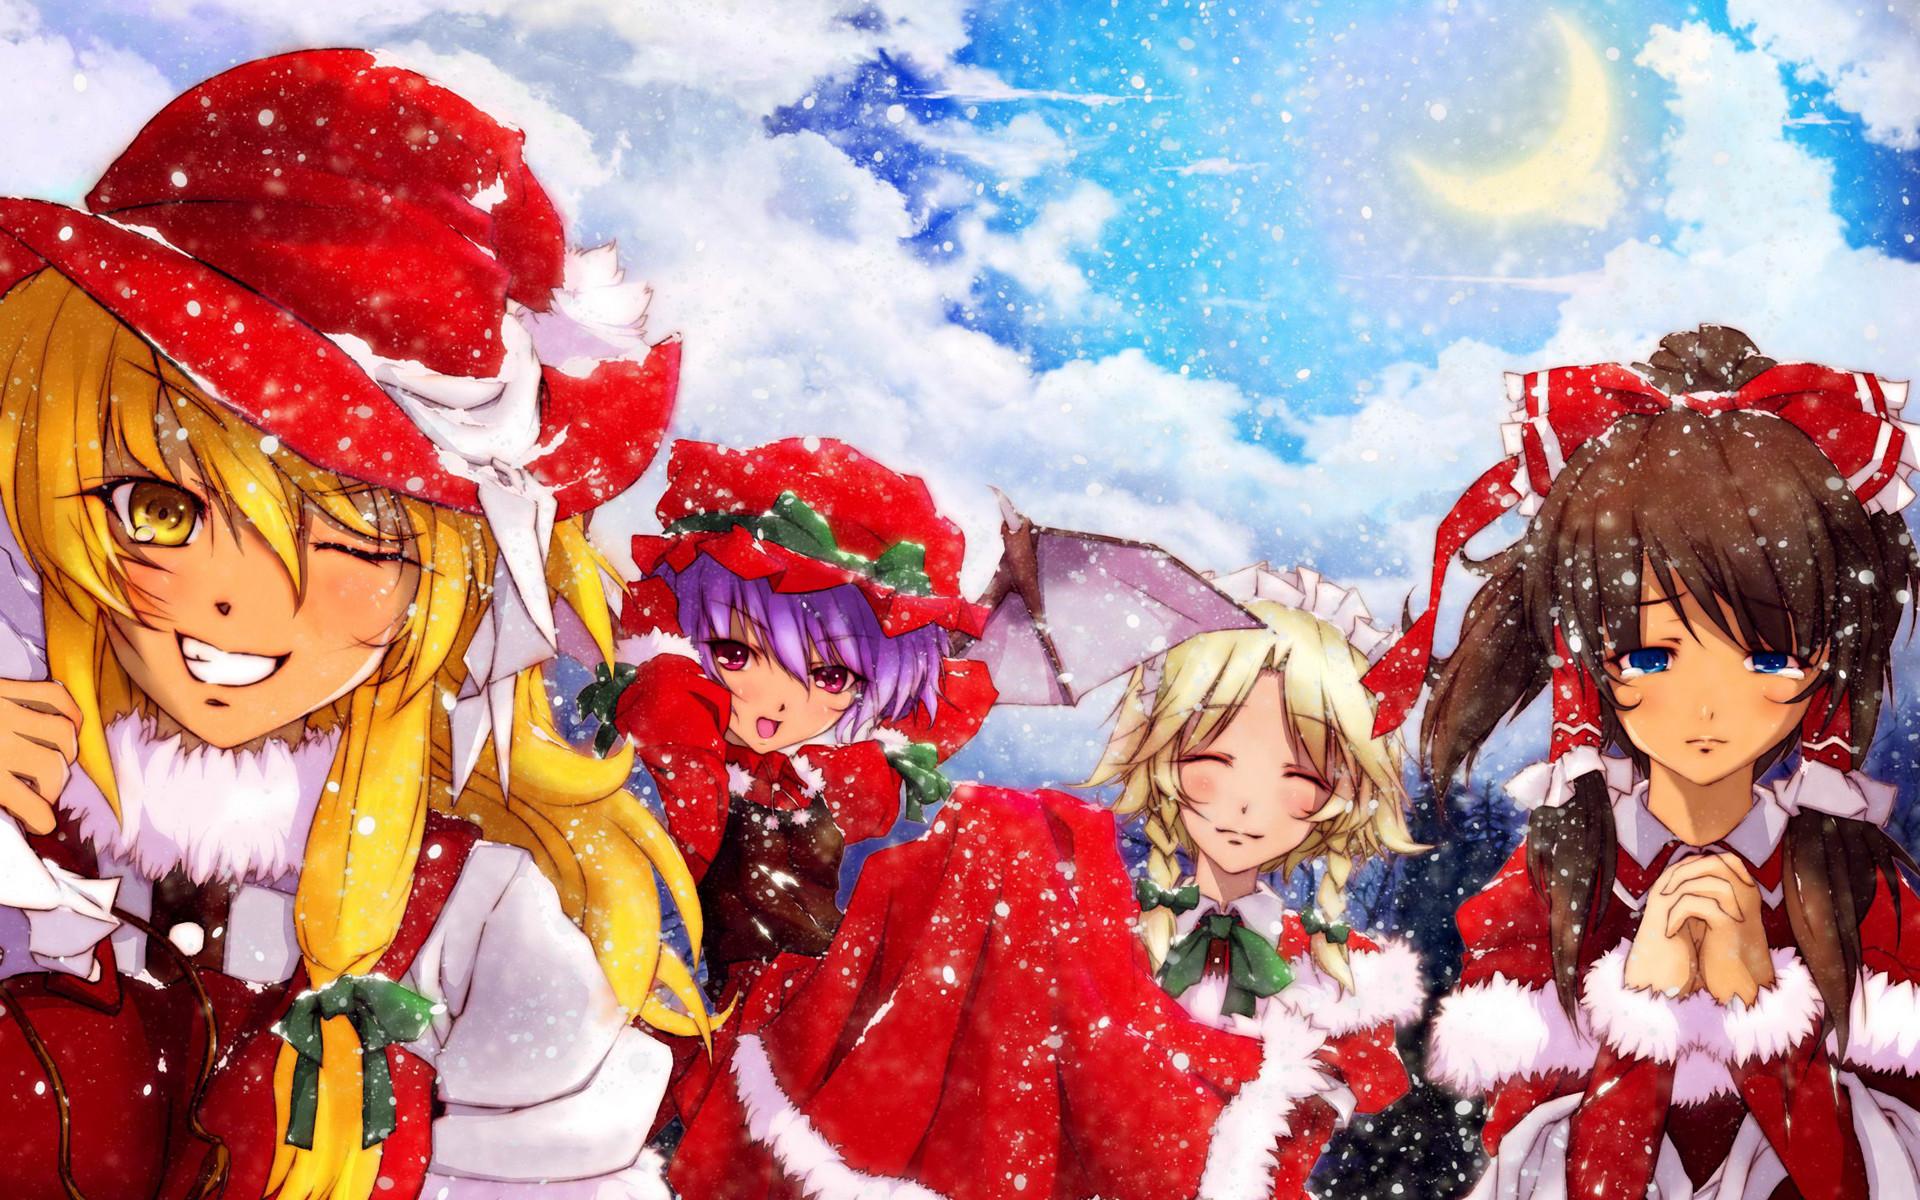 Anime christmas wallpaper hd 70 images - Anime backdrop wallpaper ...